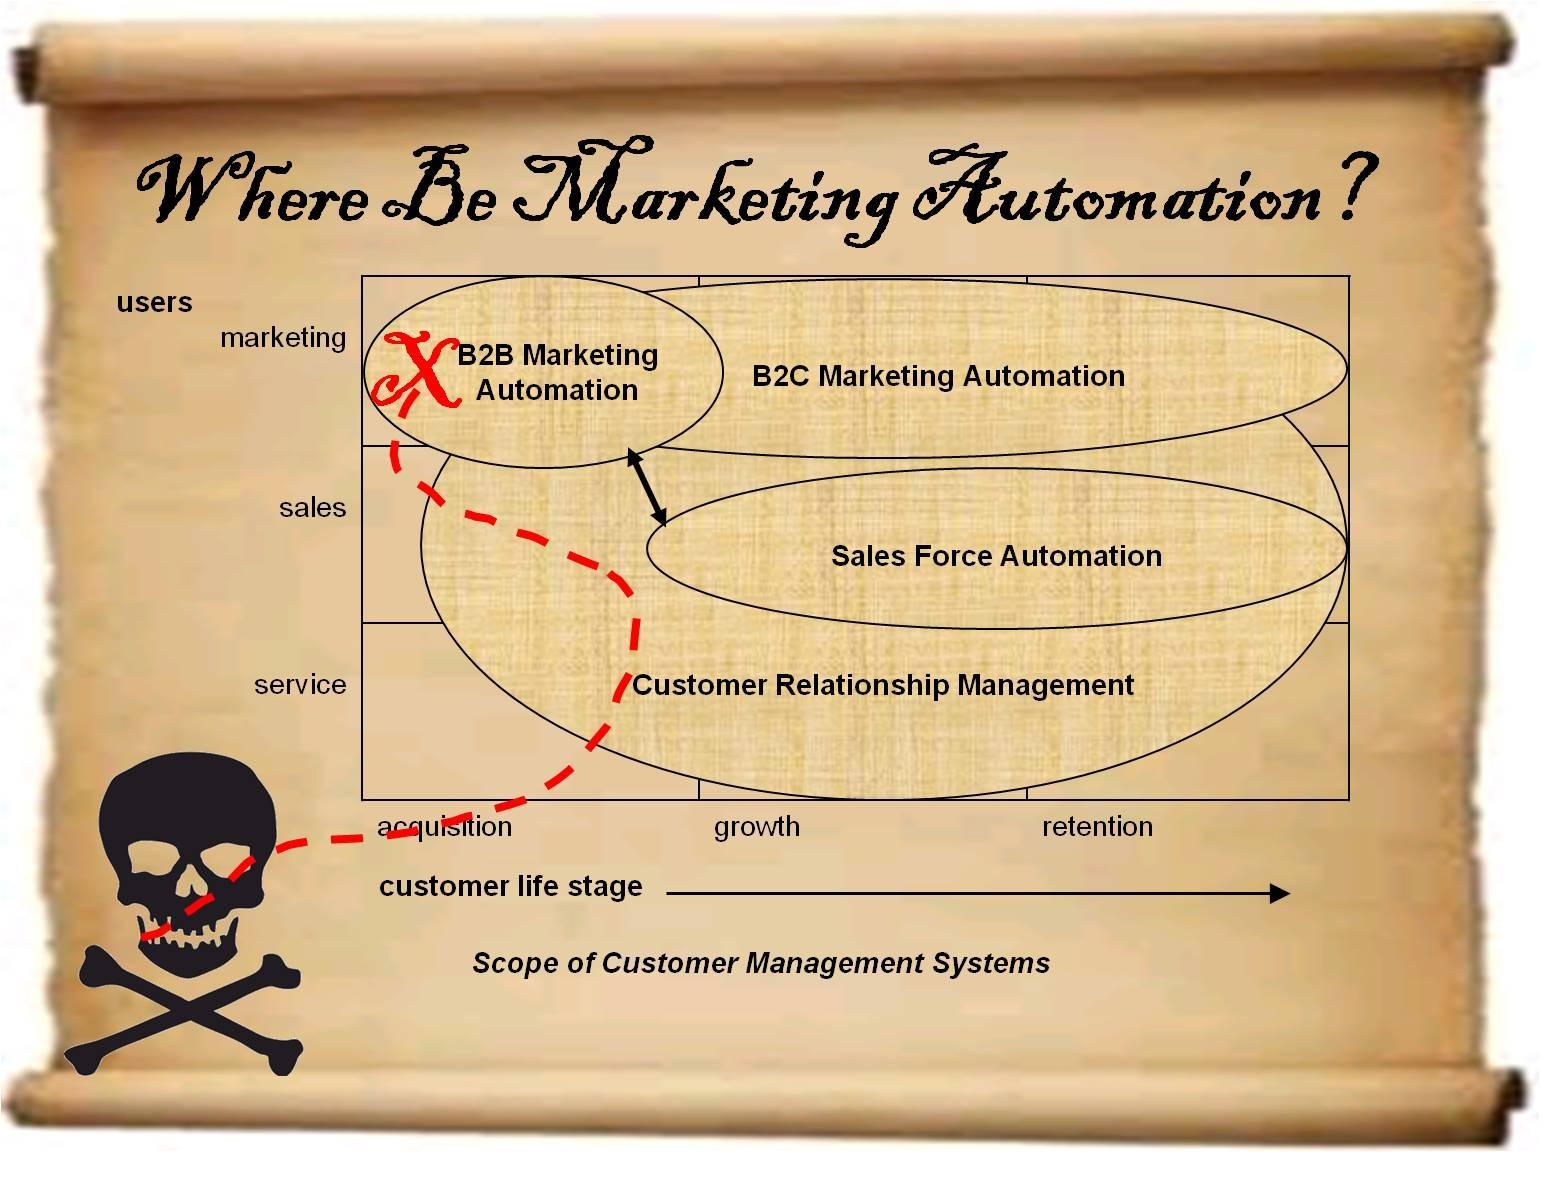 Customer Experience Matrix May